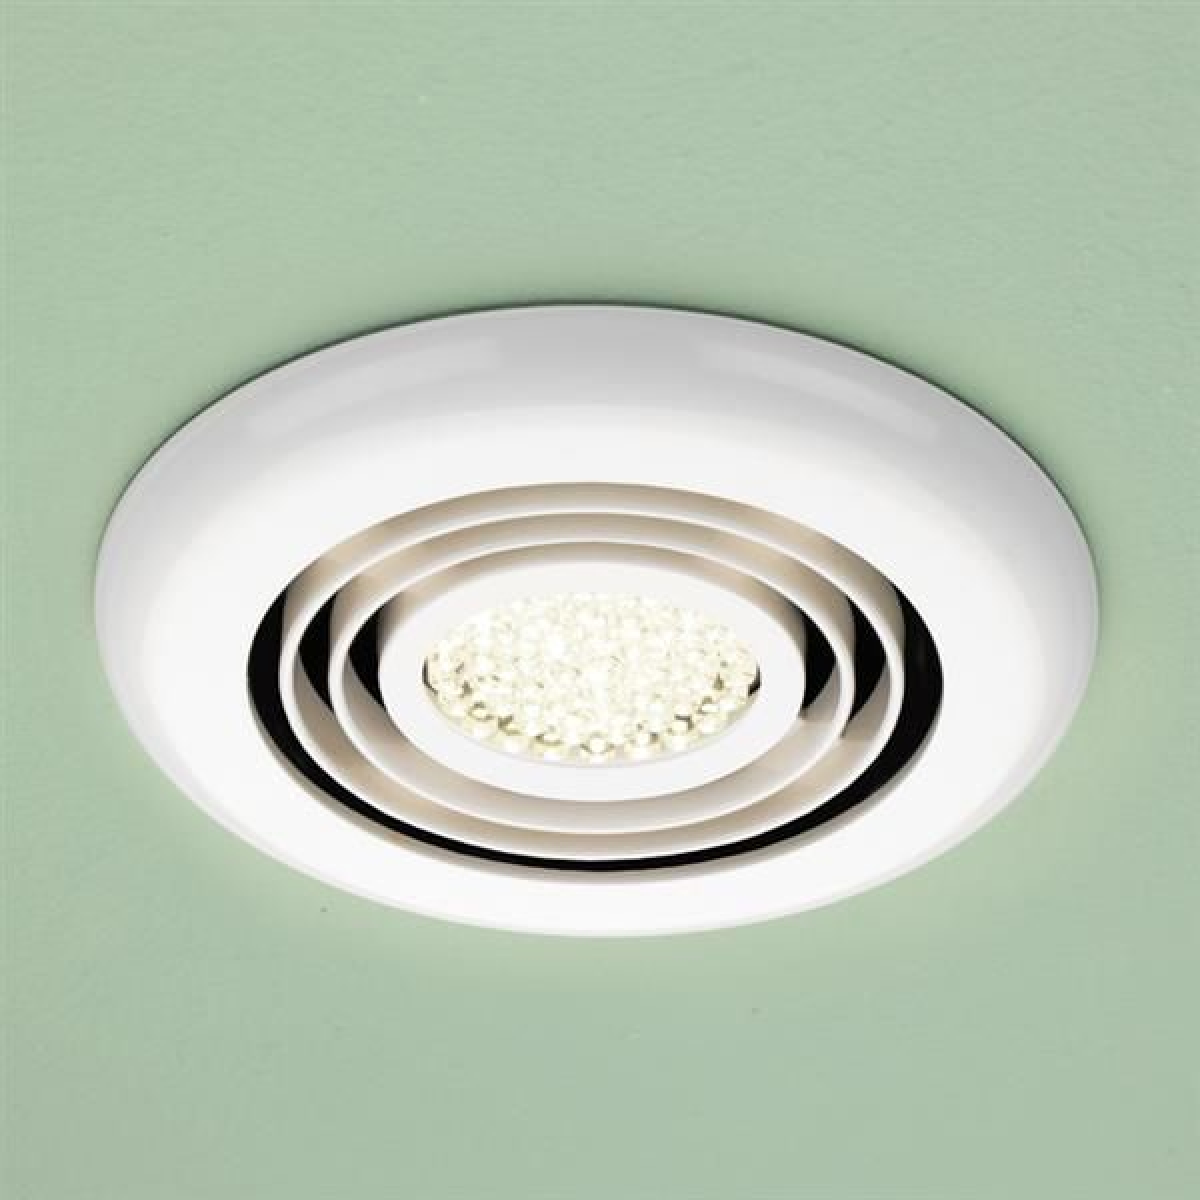 HiB Turbo Warm White LED Inline Bathroom Extractor Fan in White